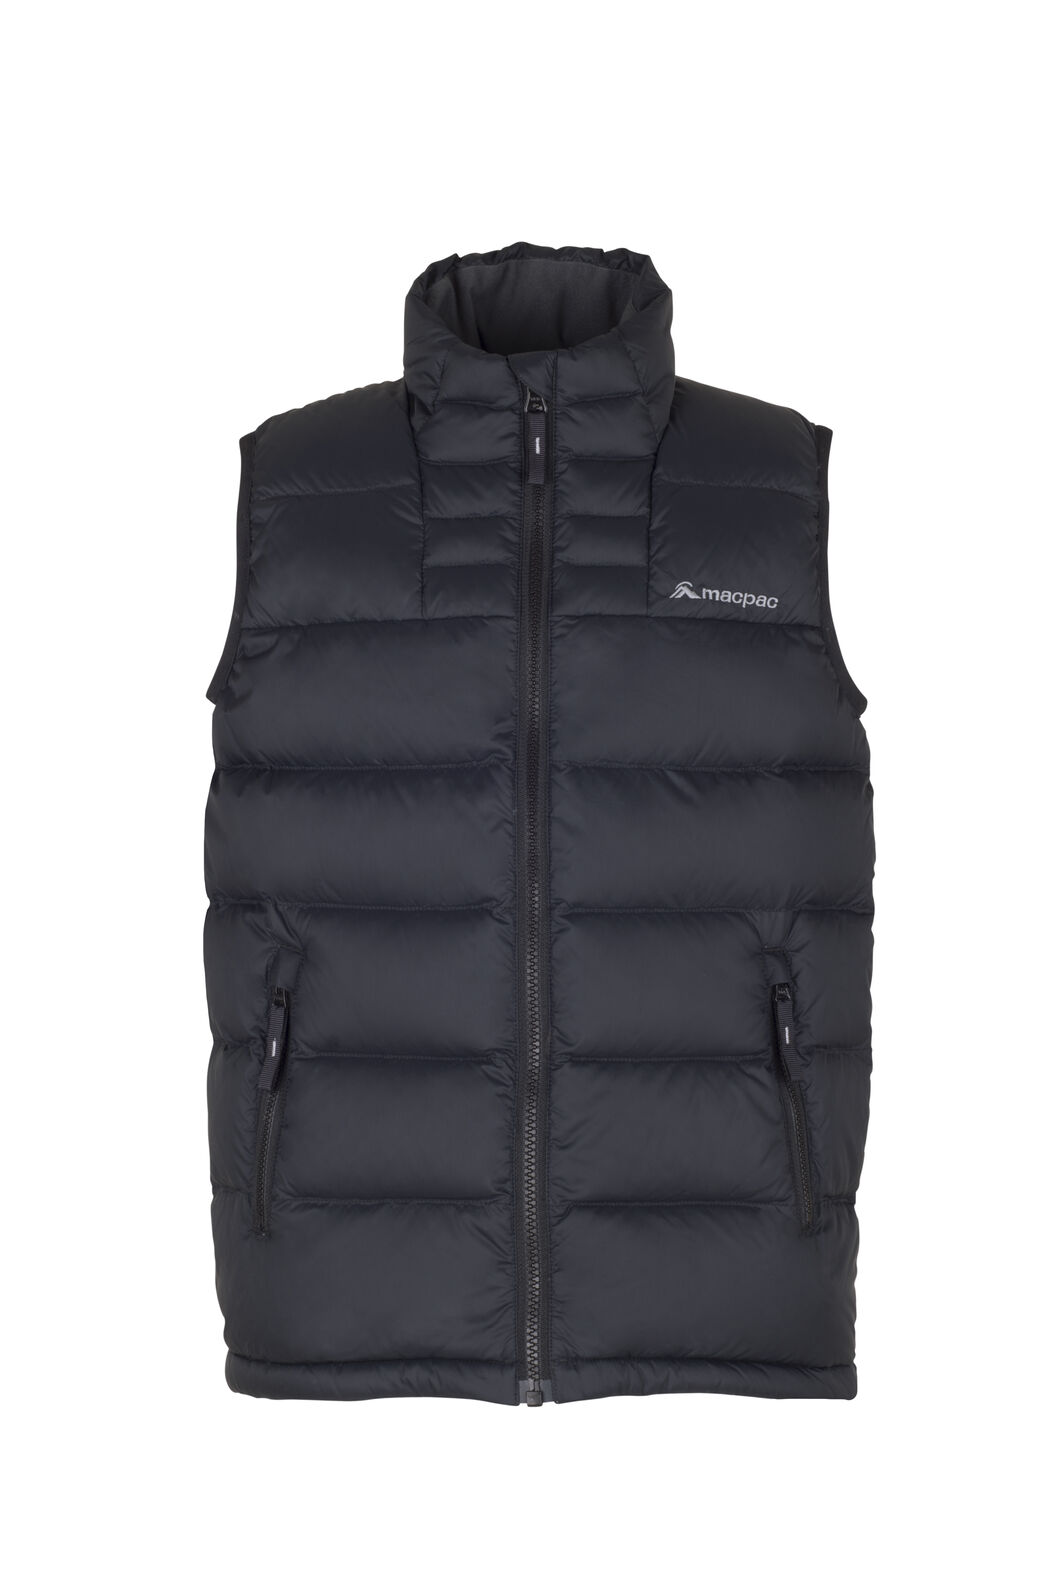 Macpac Atom Vest - Kids', Black, hi-res